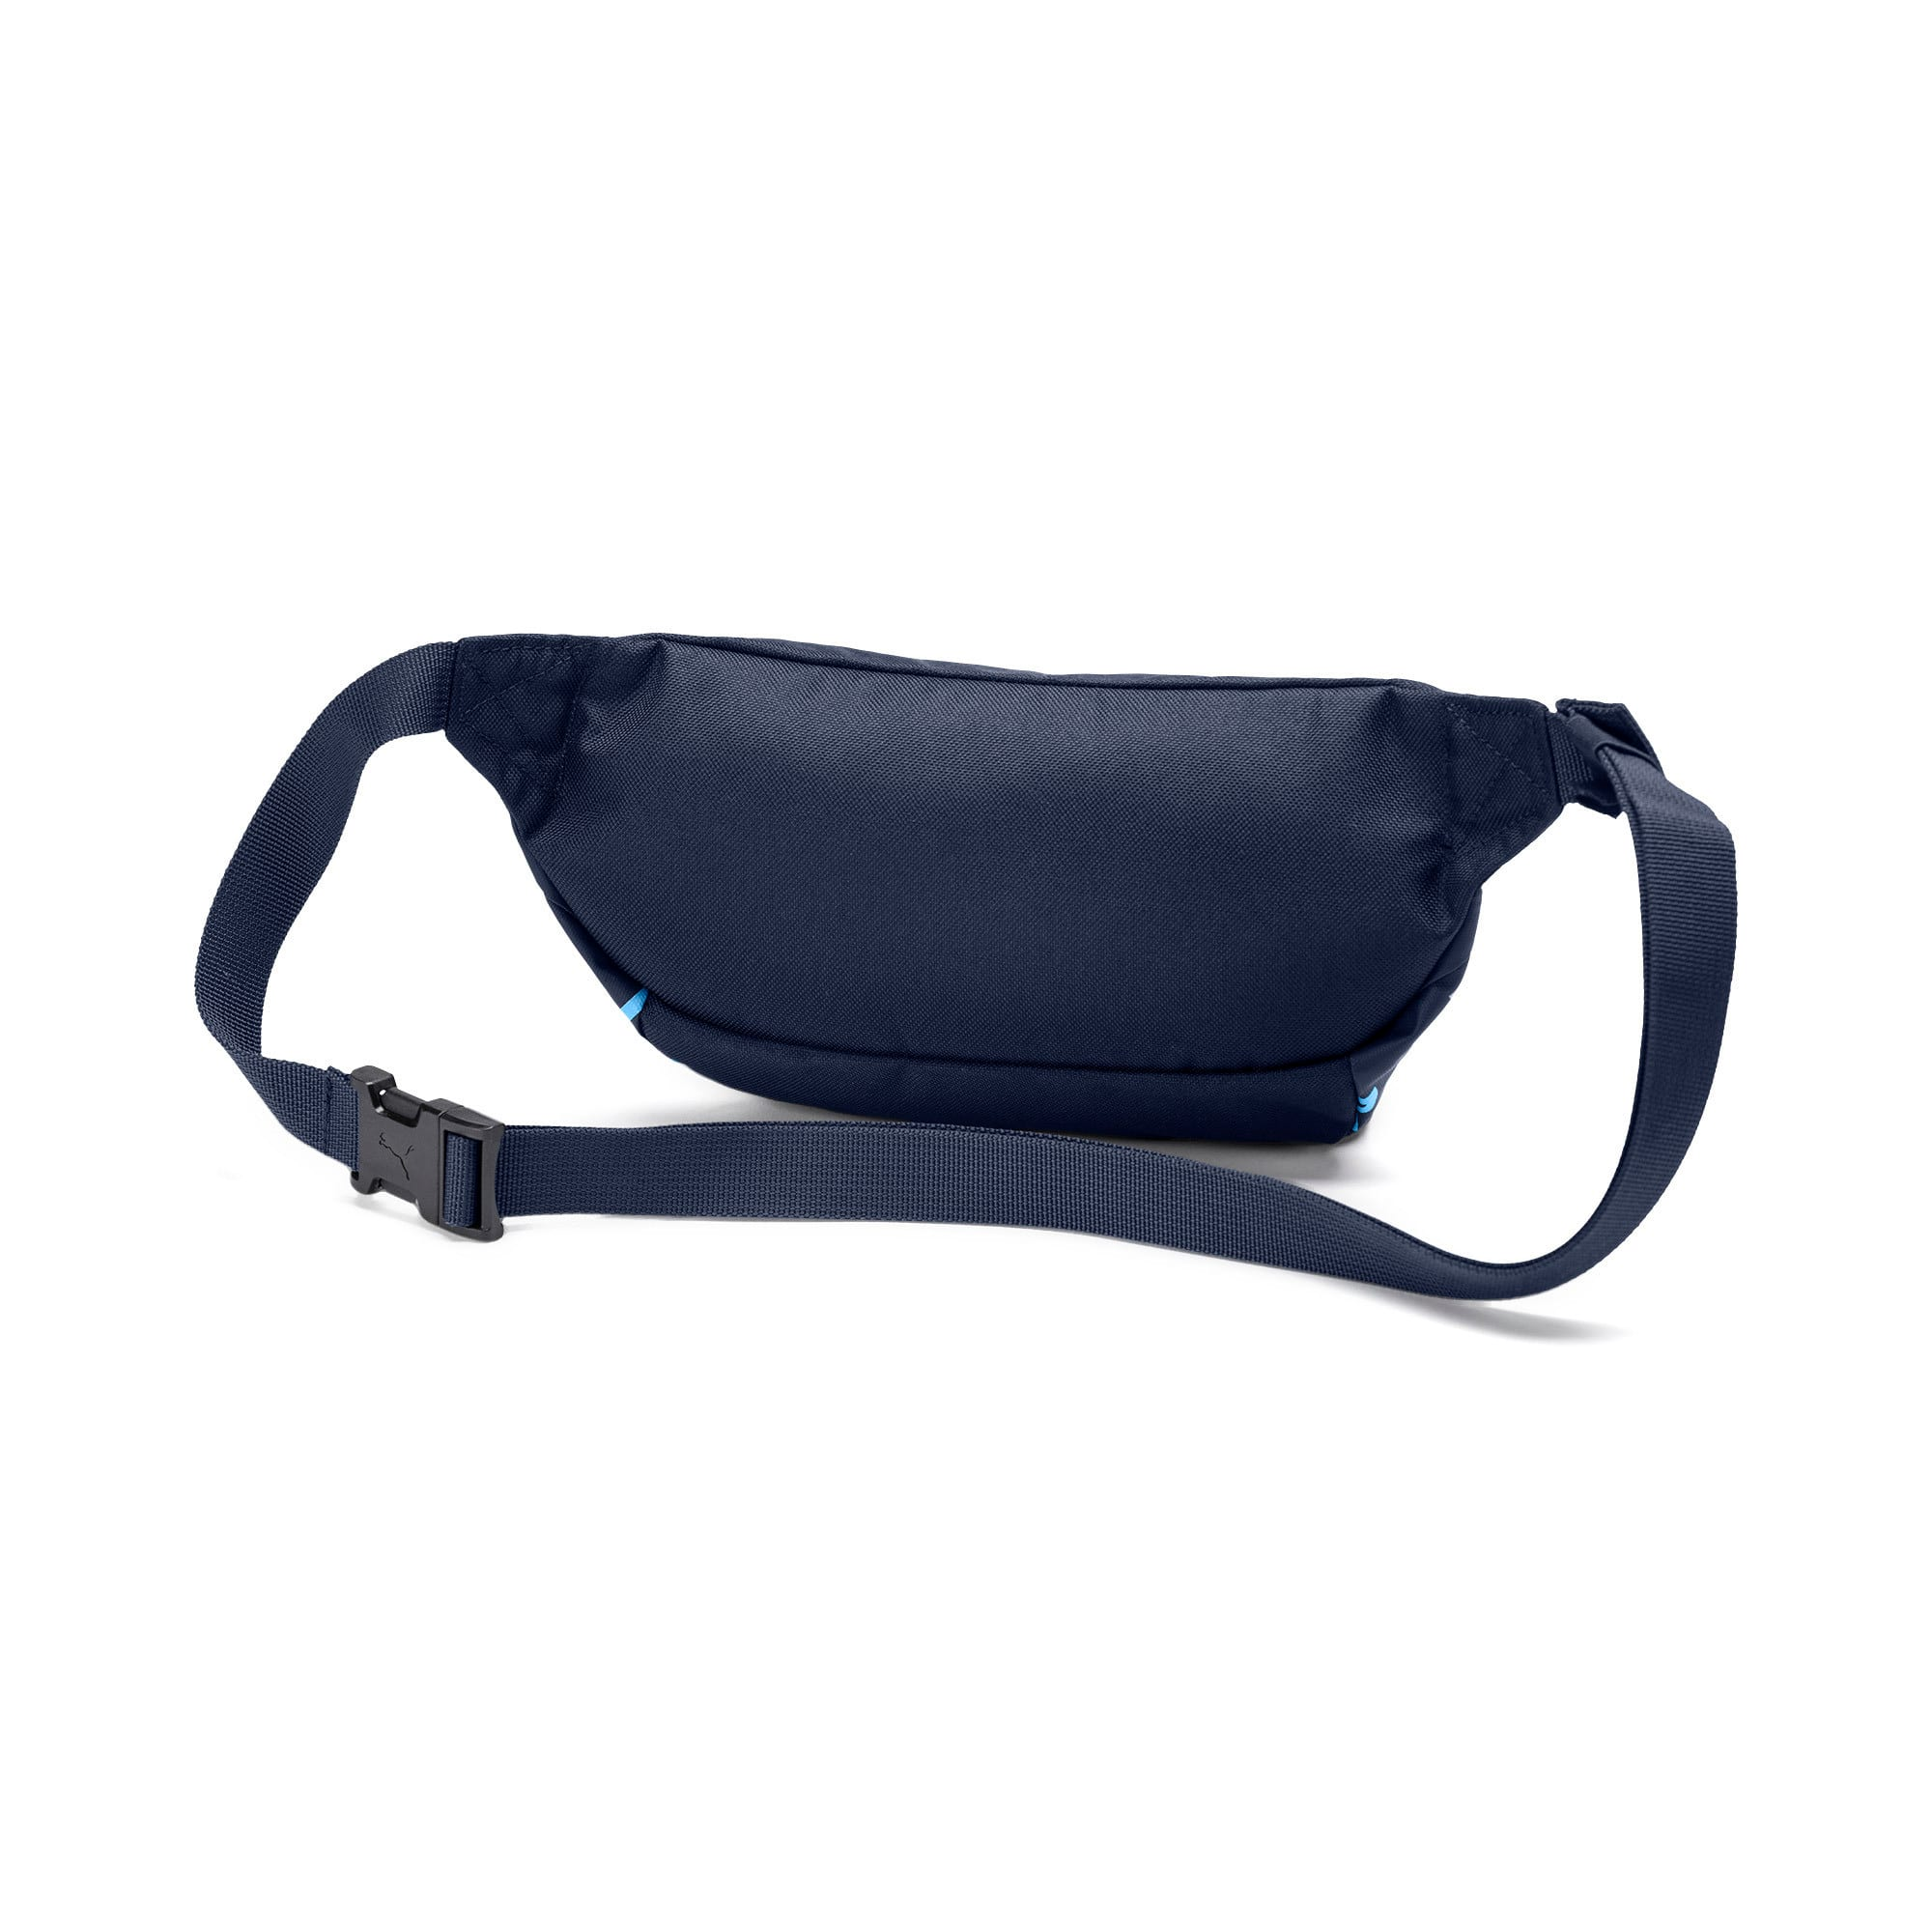 Thumbnail 2 of Man City Waist Bag, Peacoat-Team Light Blue, medium